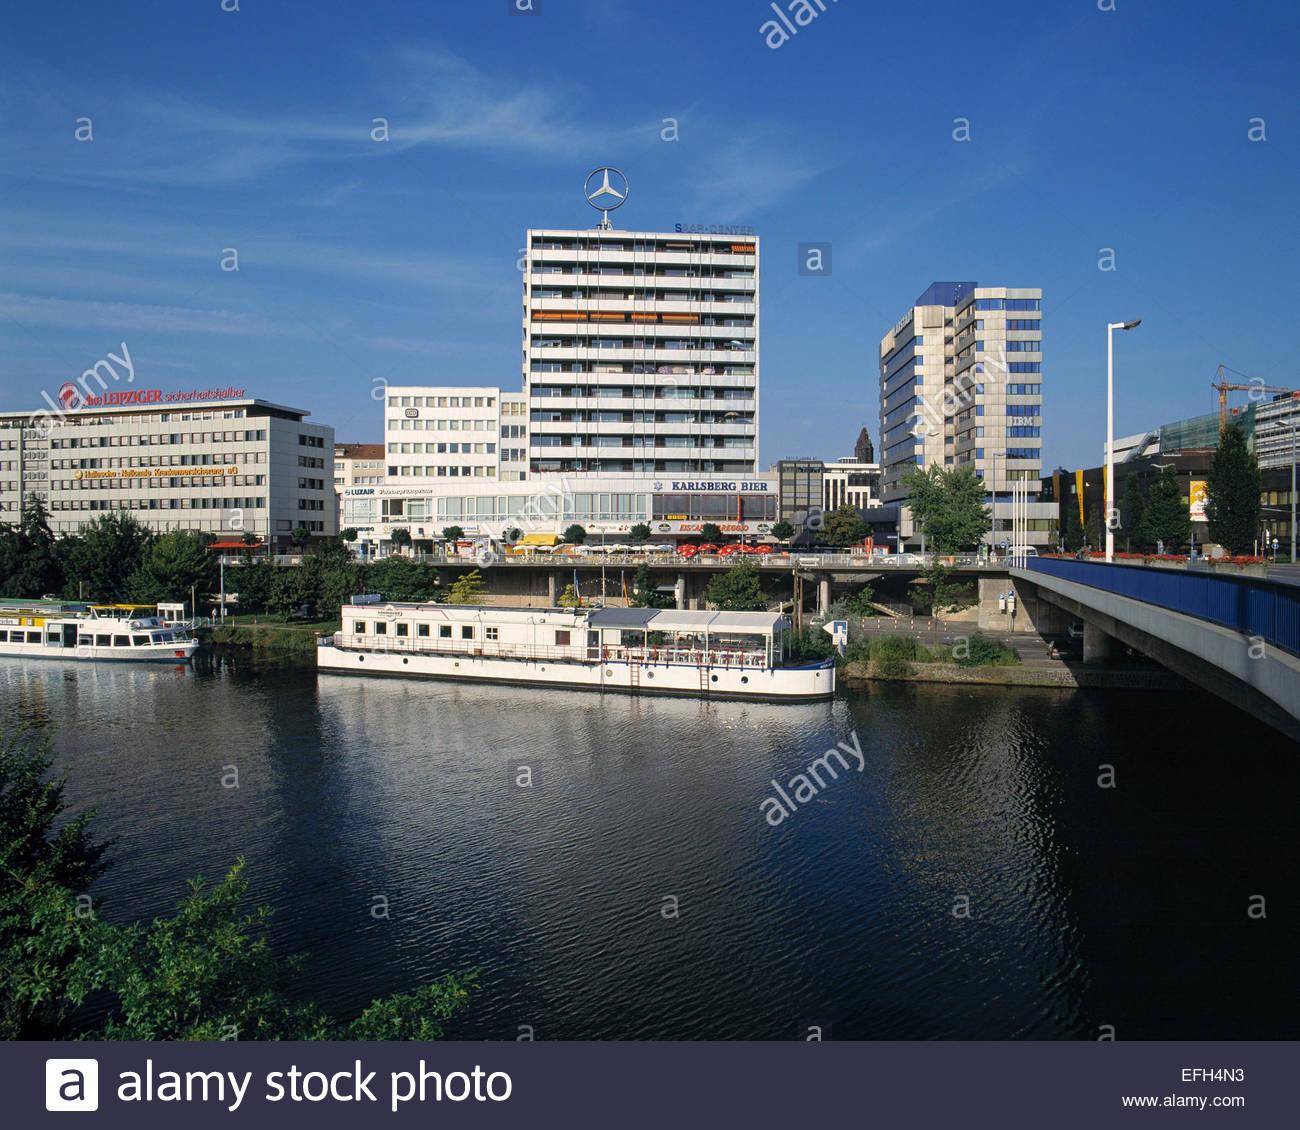 D-Saarbruecken, D-Saarbruecken-St. Johann, Saar, Saarland, Saarufer, Flusslandschaft, Ausflugsschiffe, Geschaeftshaeuser, Stock Photo